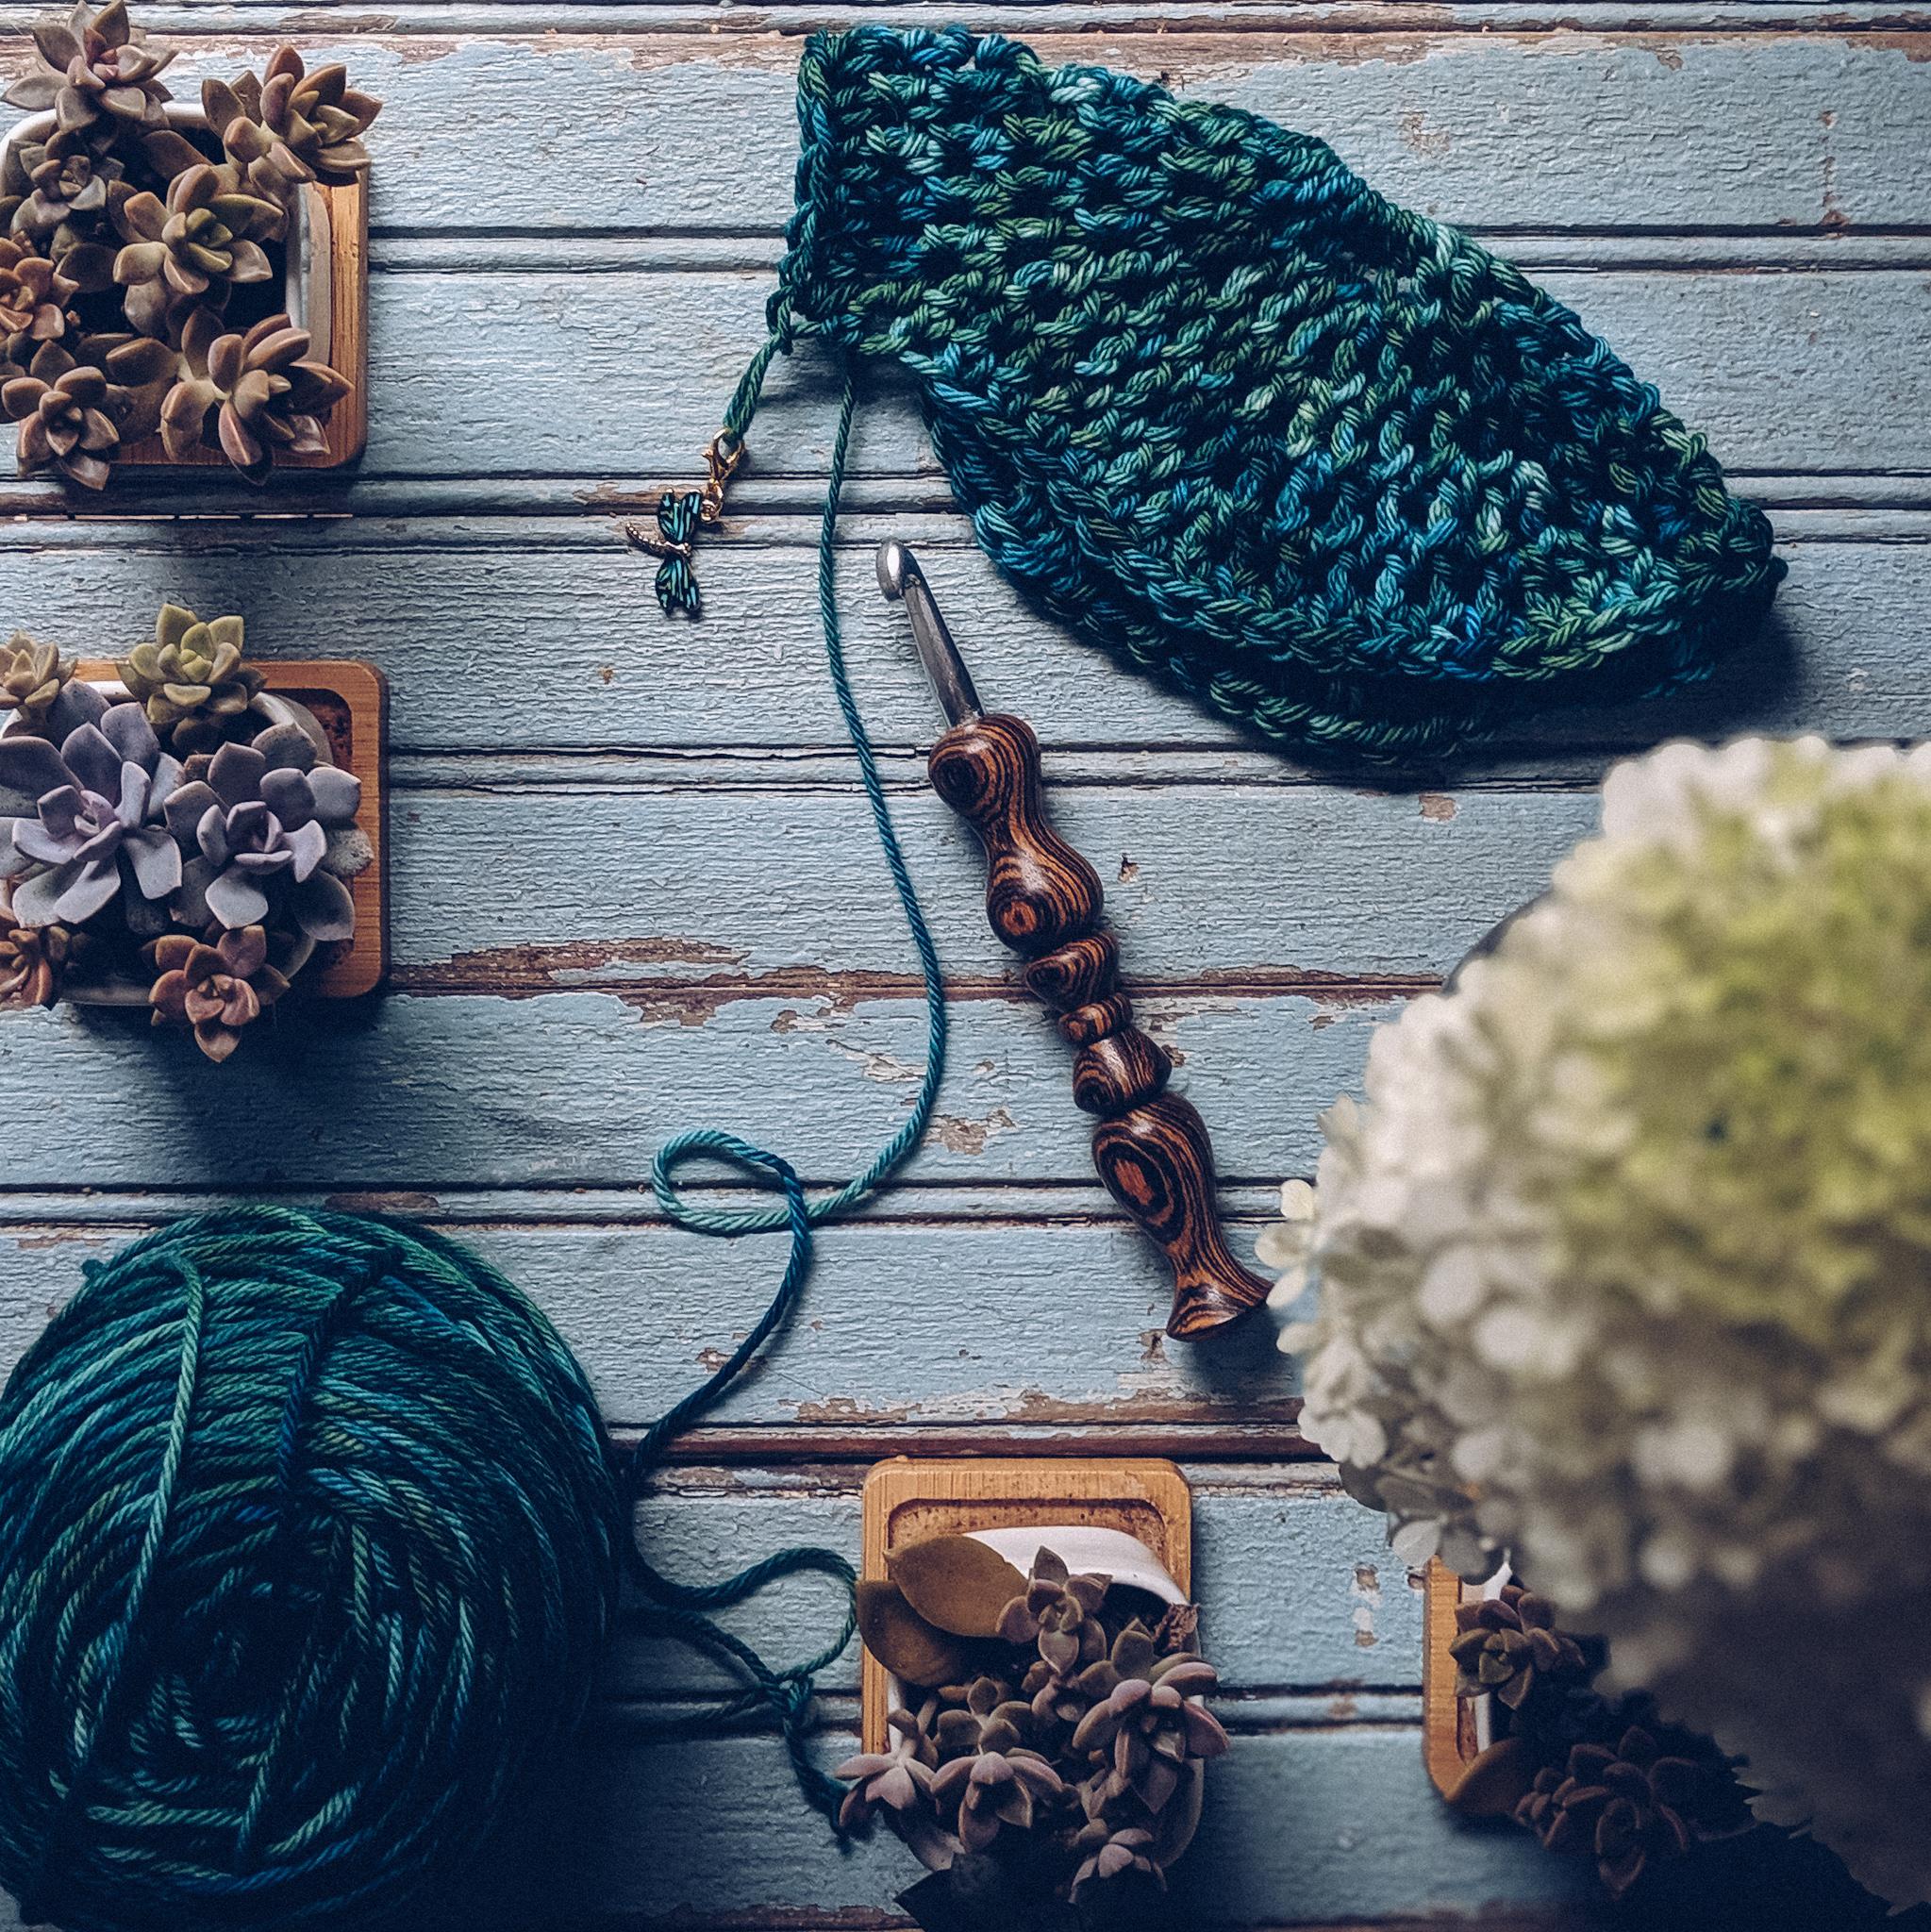 Crochet Subscription Box Review: hook, yarn, stitch marker, and more! #freecrochetpattern #crochetsupplies #crochet